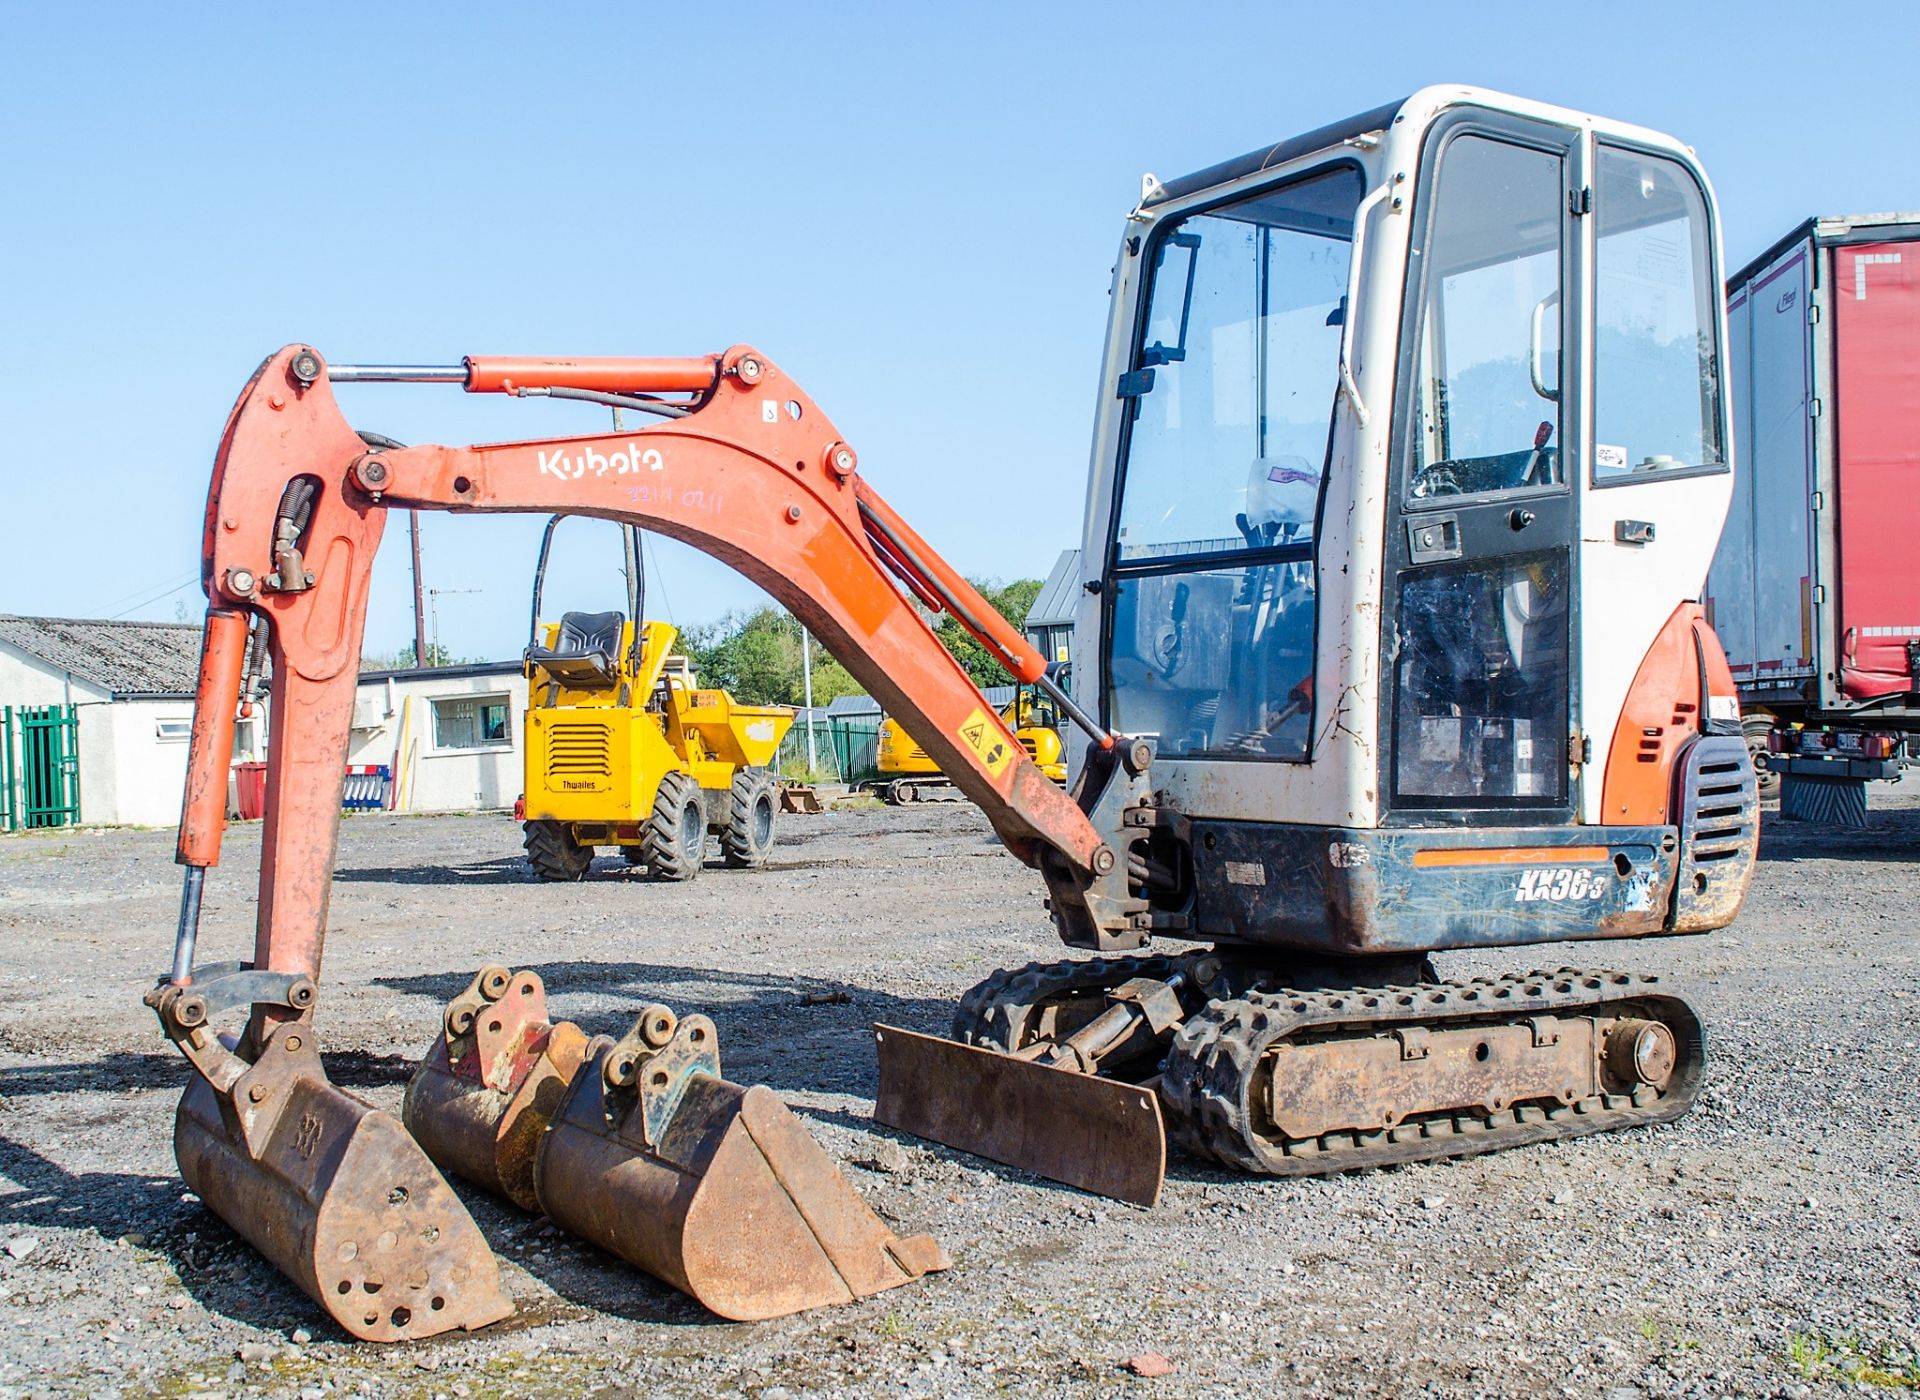 Lot 20 - Kubota KX36-3 1.5 tonne rubber tracked mini excavator Year: 2007 S/N: Z077298 Recorded Hours: 4205